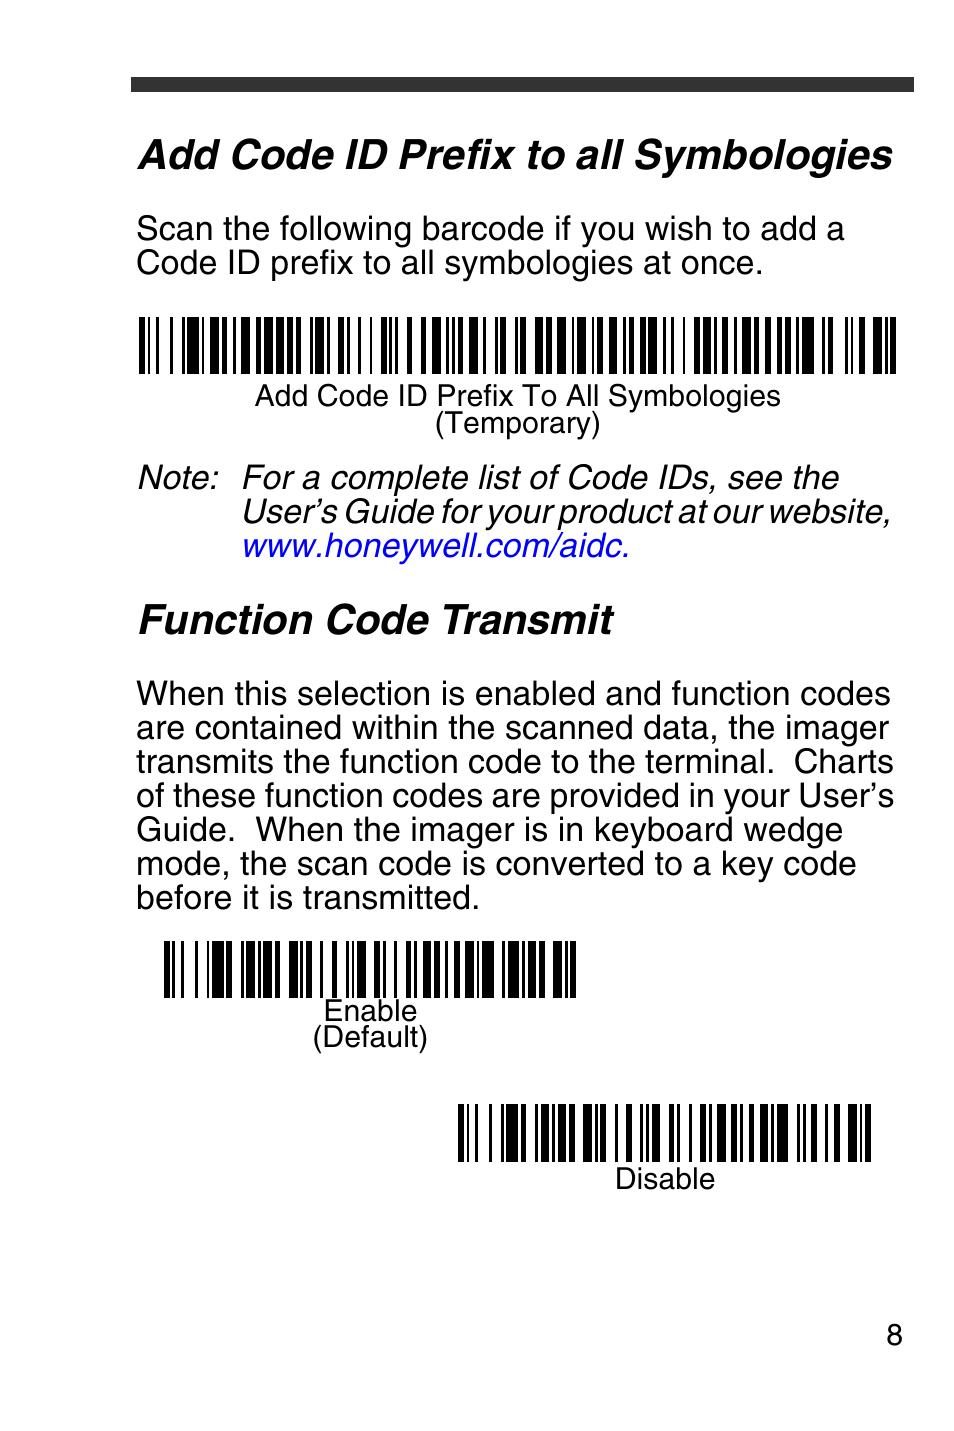 Honeywell 4600g scanner manual